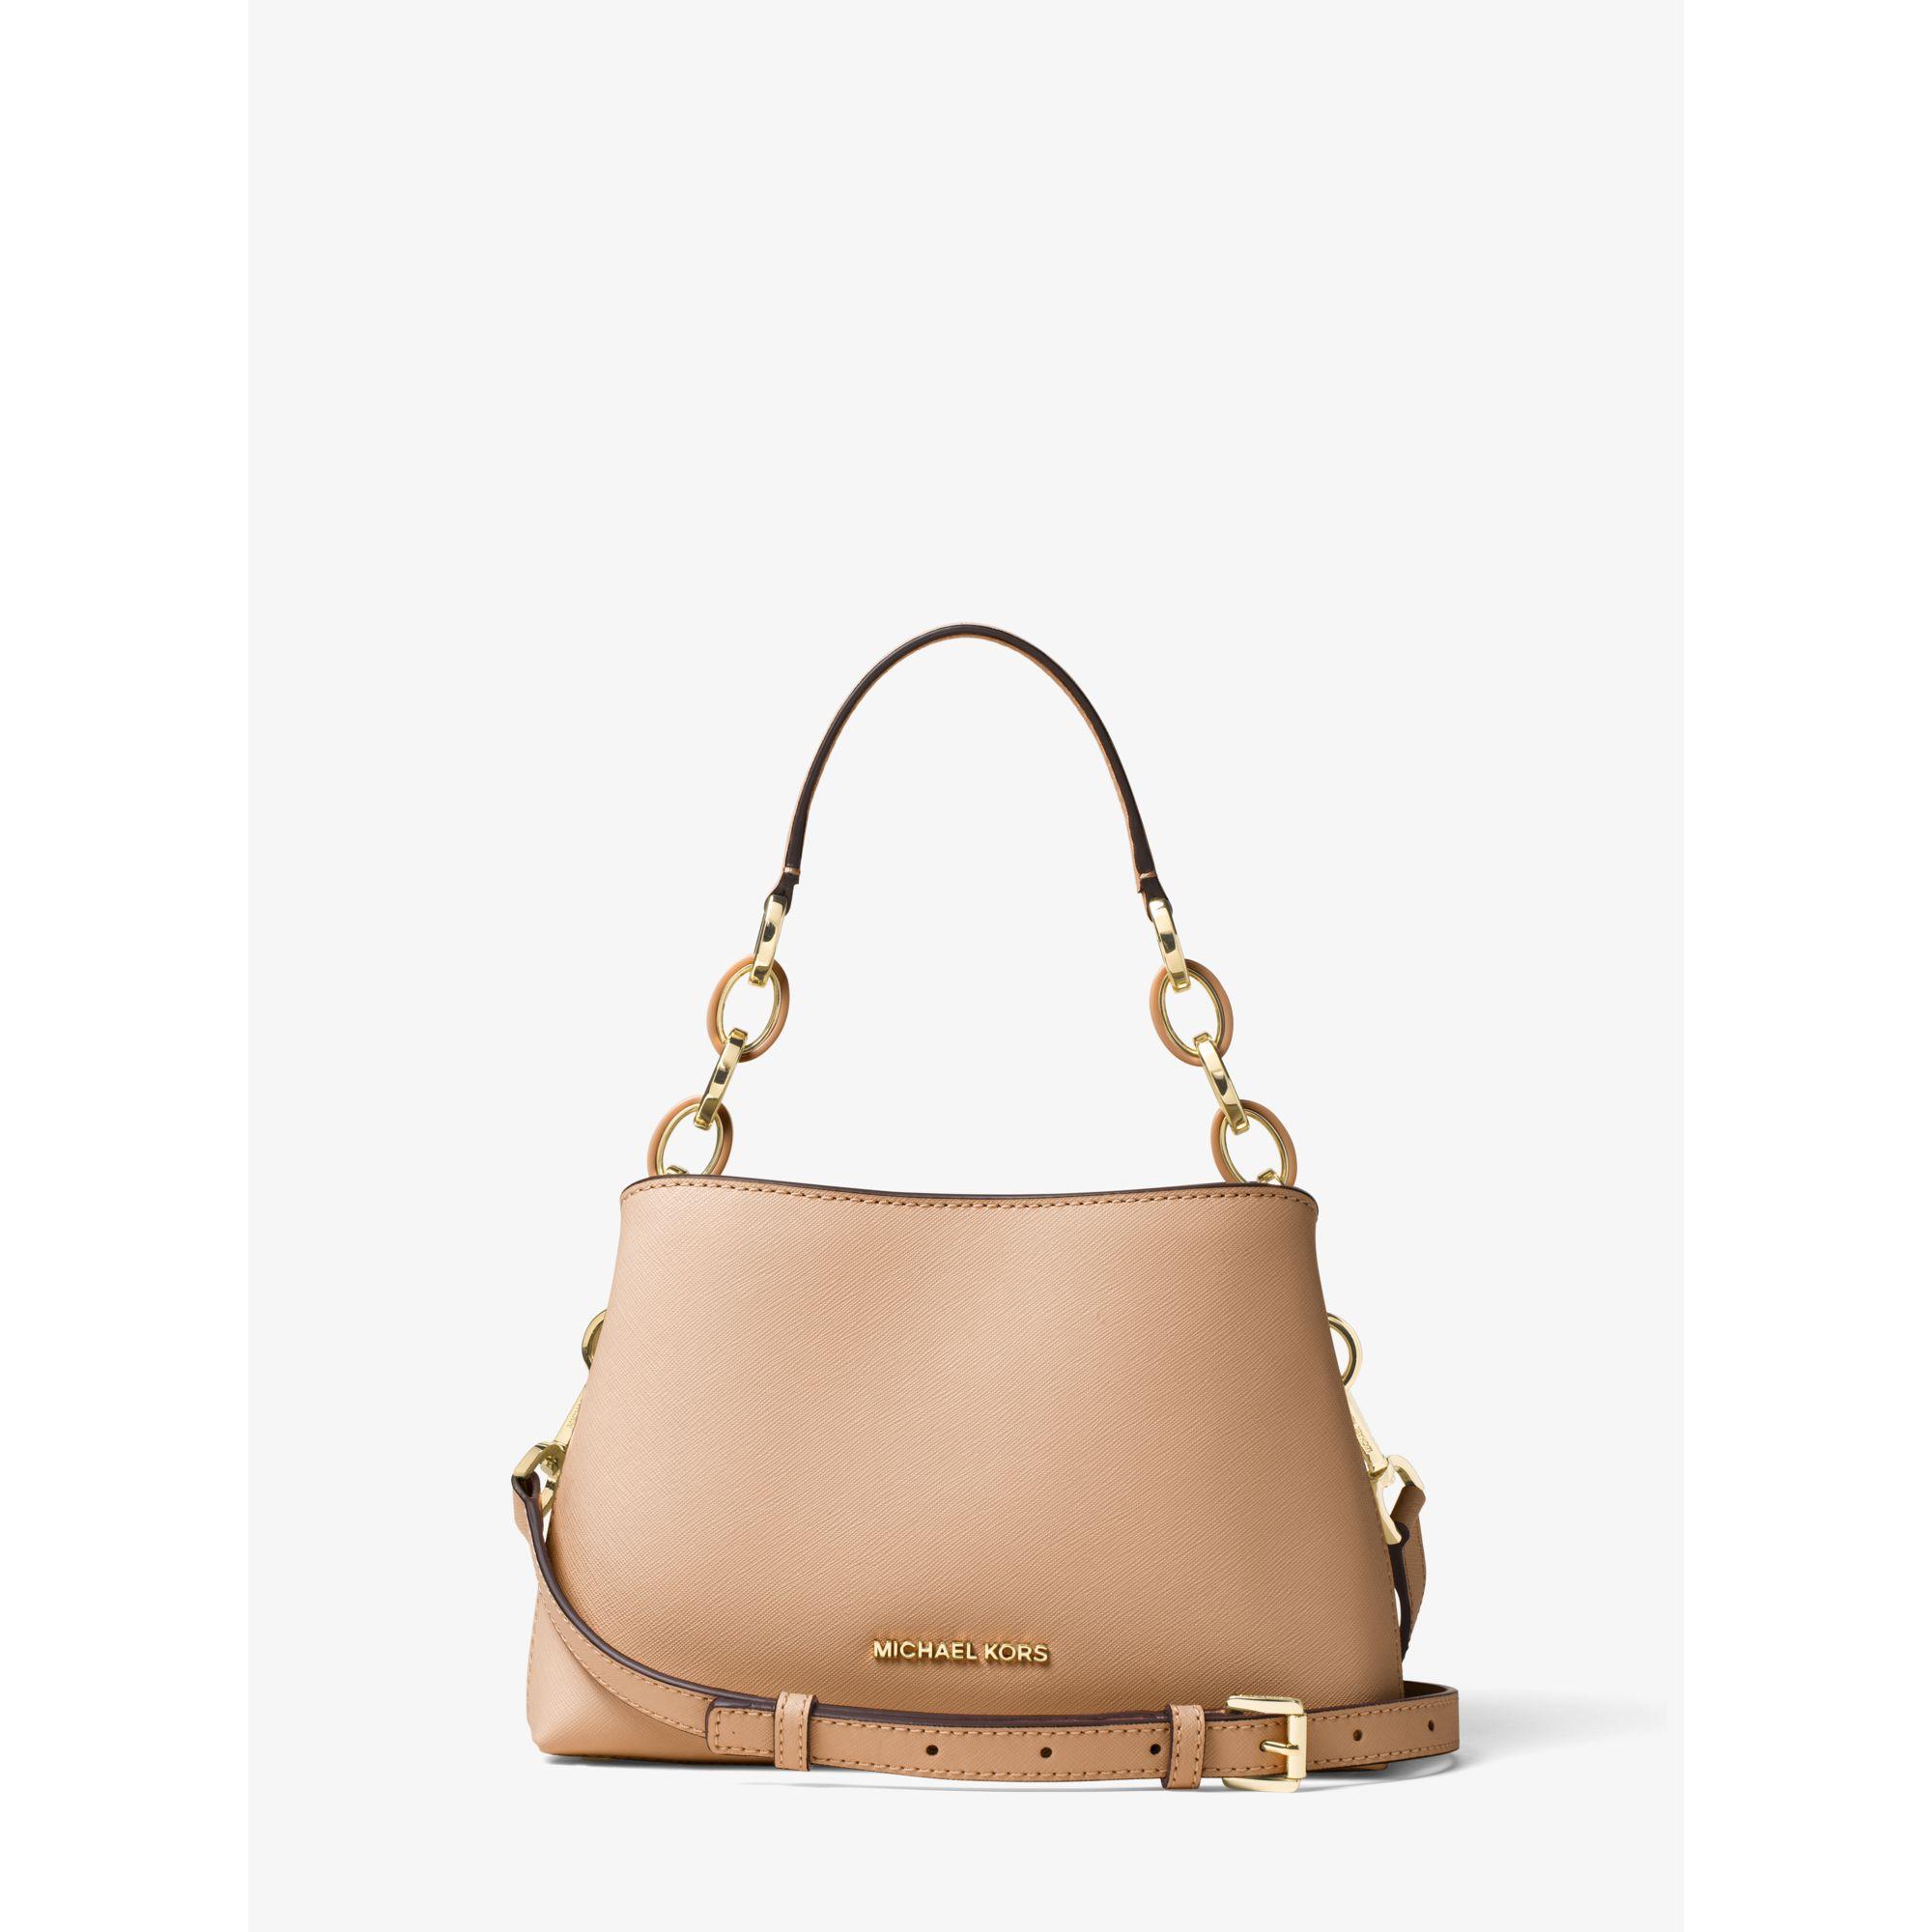 Michael Kors Portia Small Saffiano Leather Shoulder Bag In